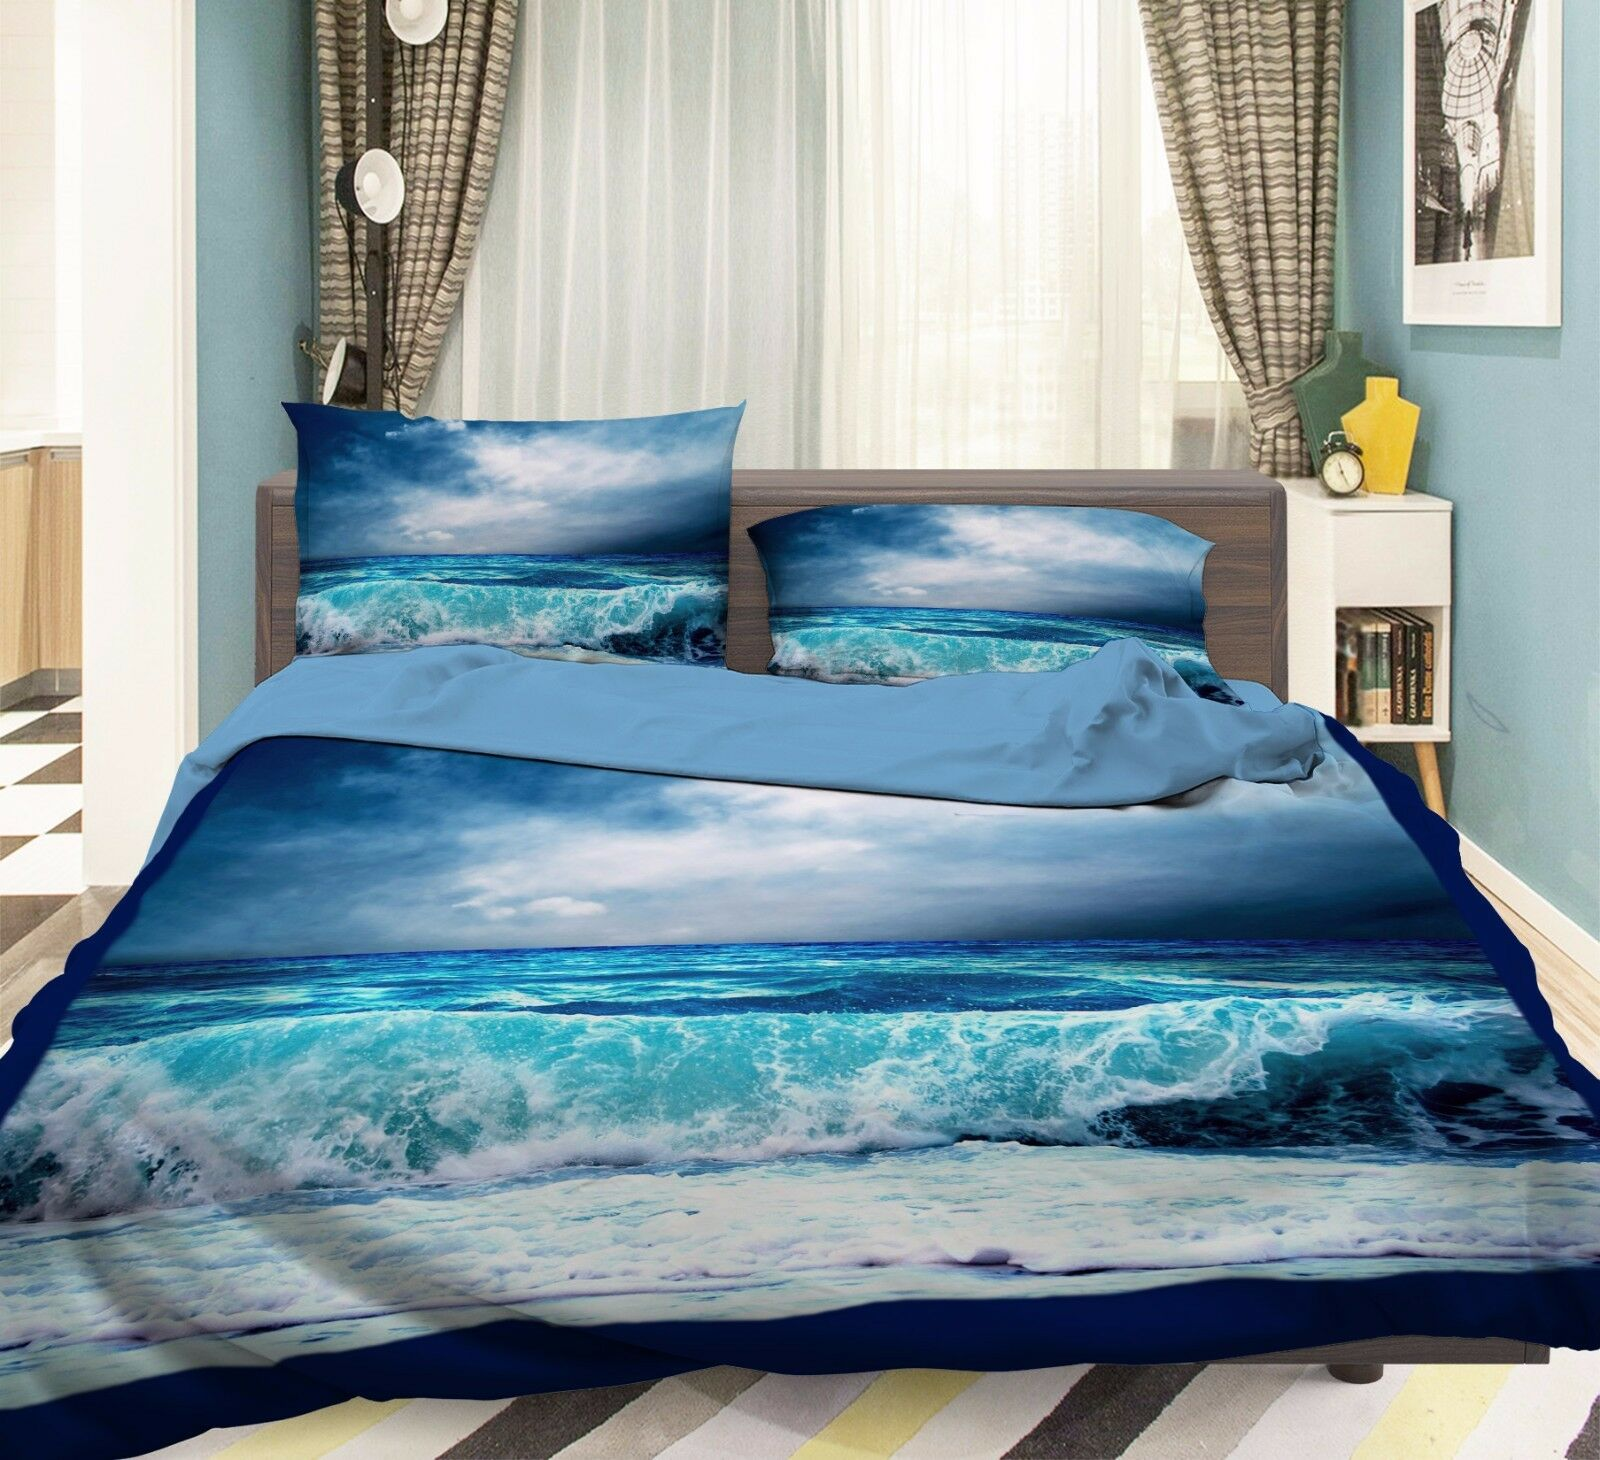 3D Waves Bule 774 Bed Pillowcases Quilt Duvet Cover Set Single Queen UK Summer